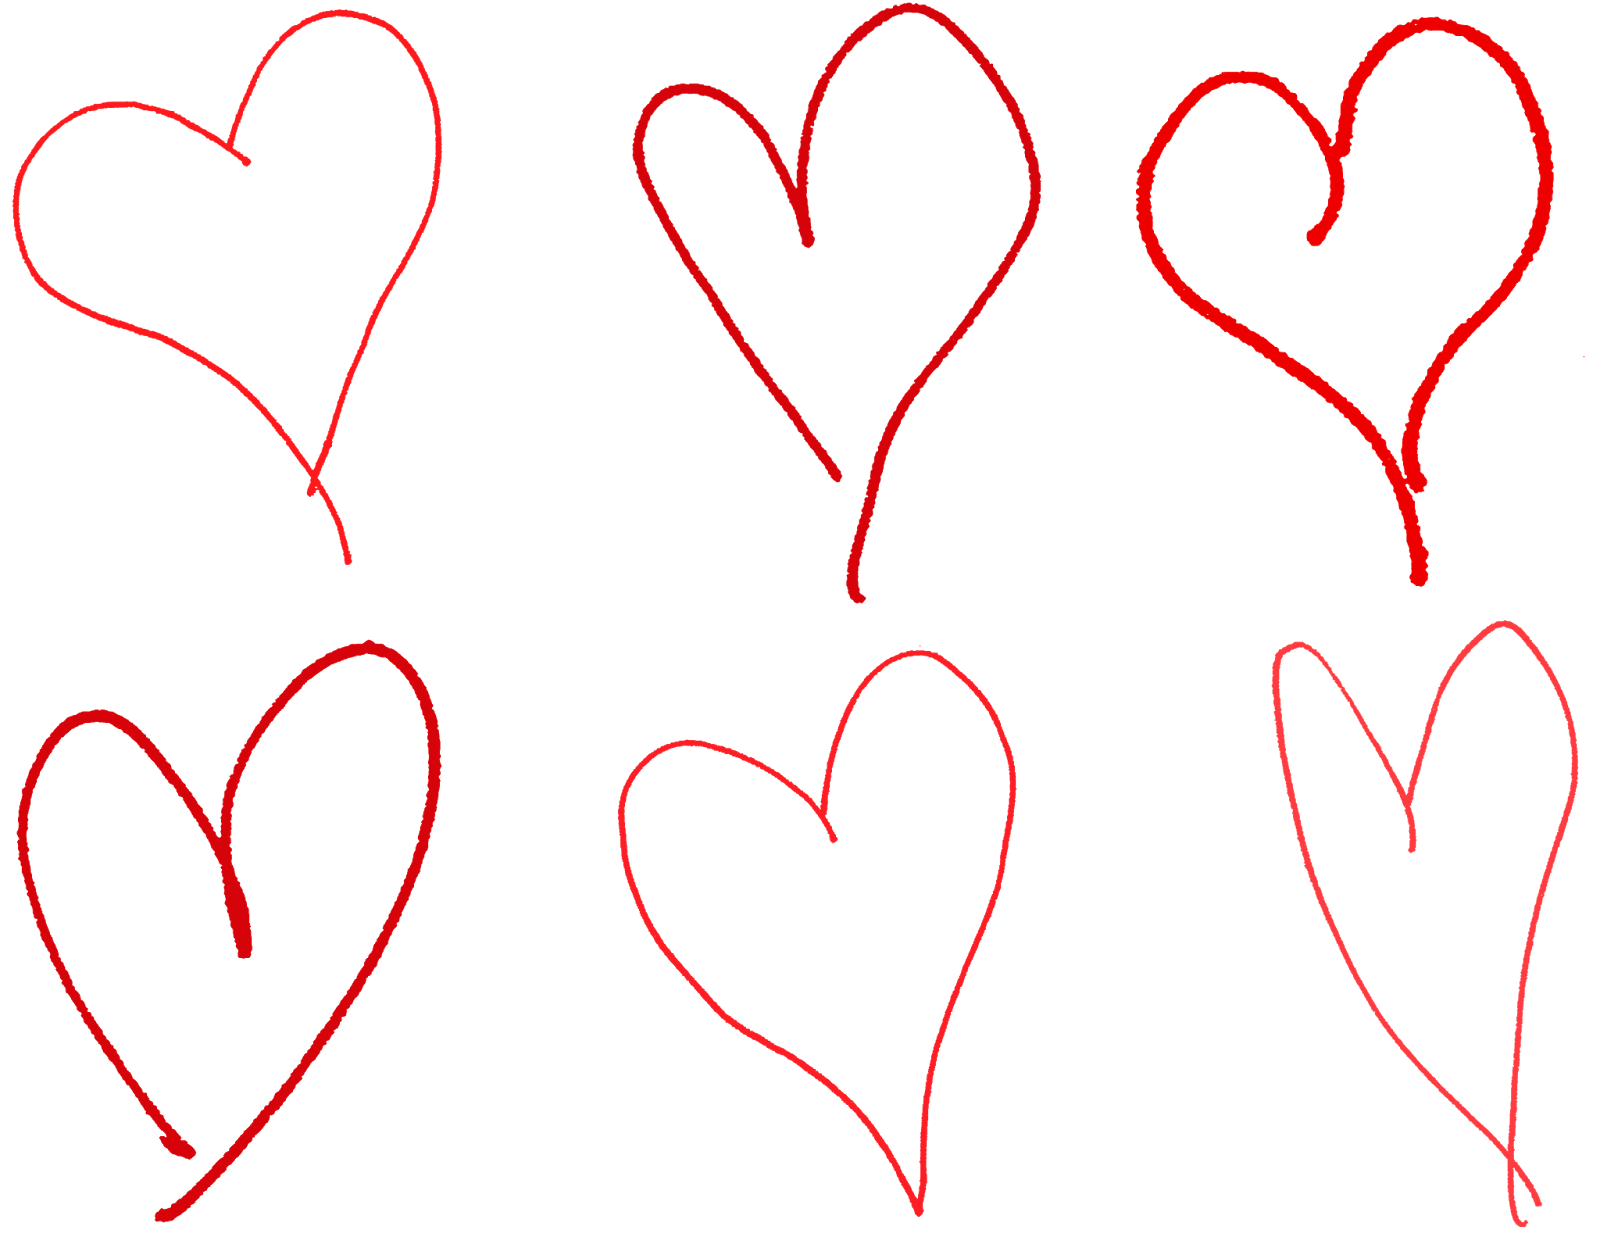 vector royalty free download Valentine drawing heart. Digital stamp design hand